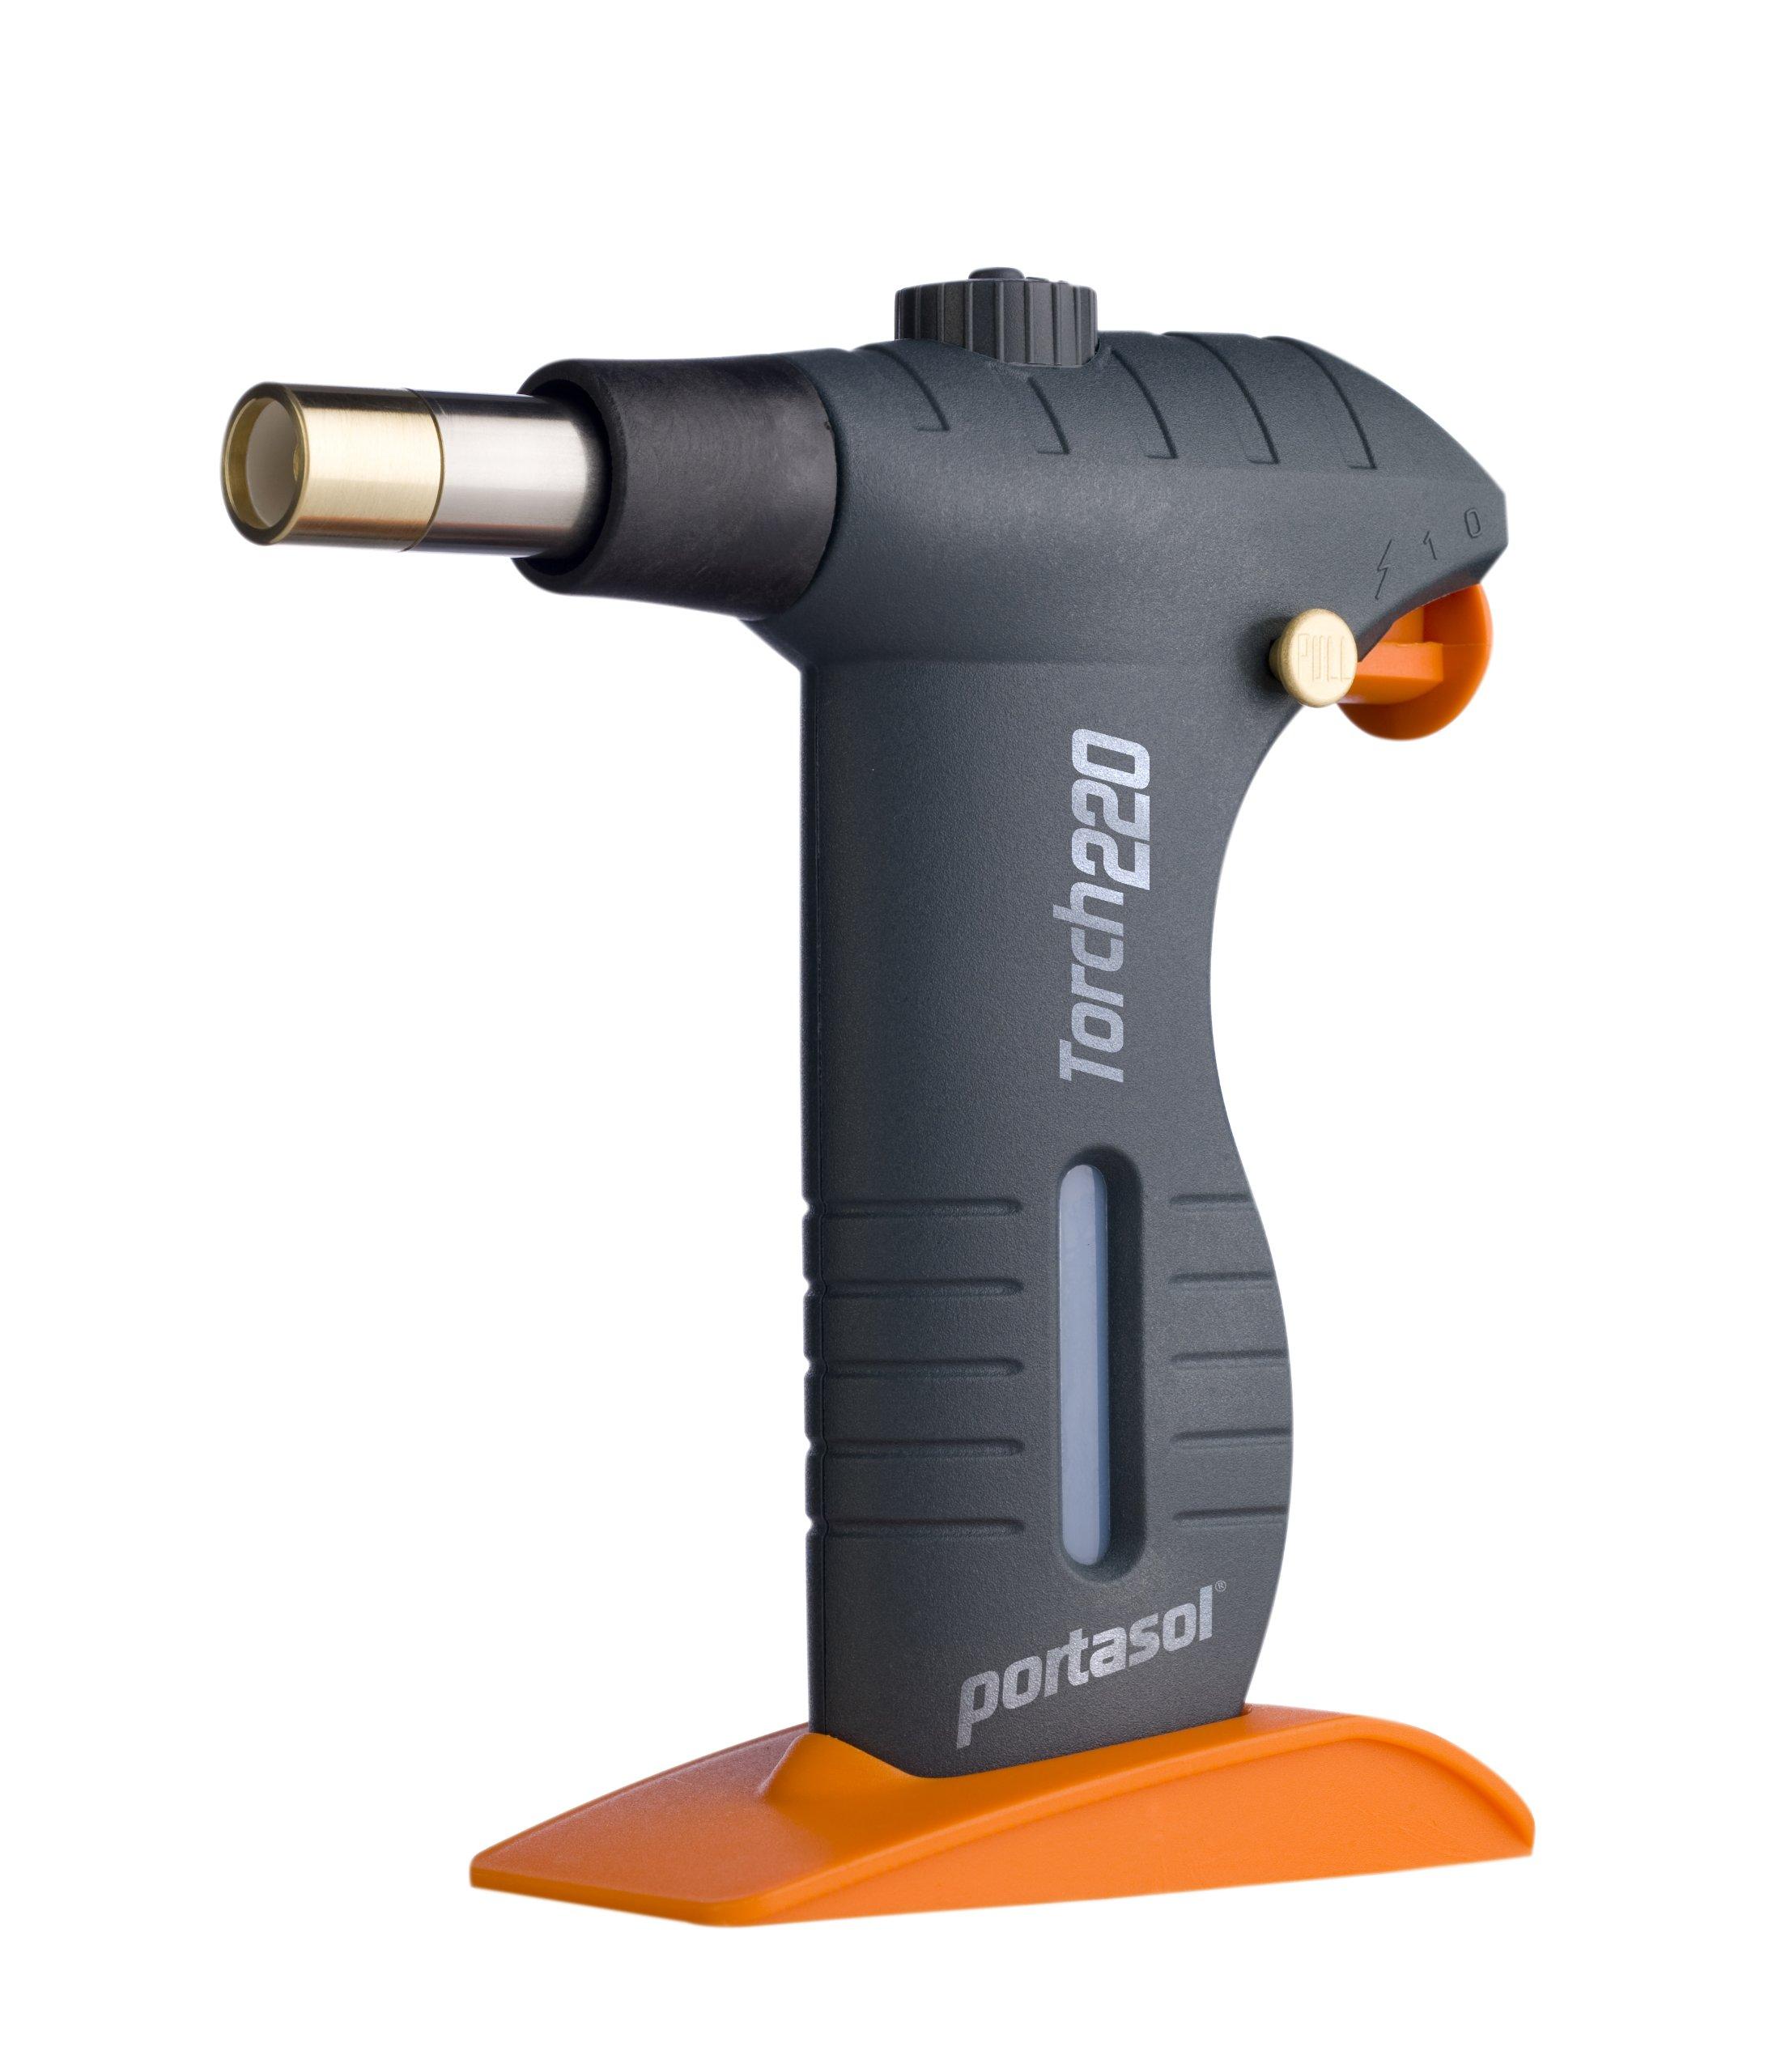 Portasol 011880070 220 Watt Gas Torch